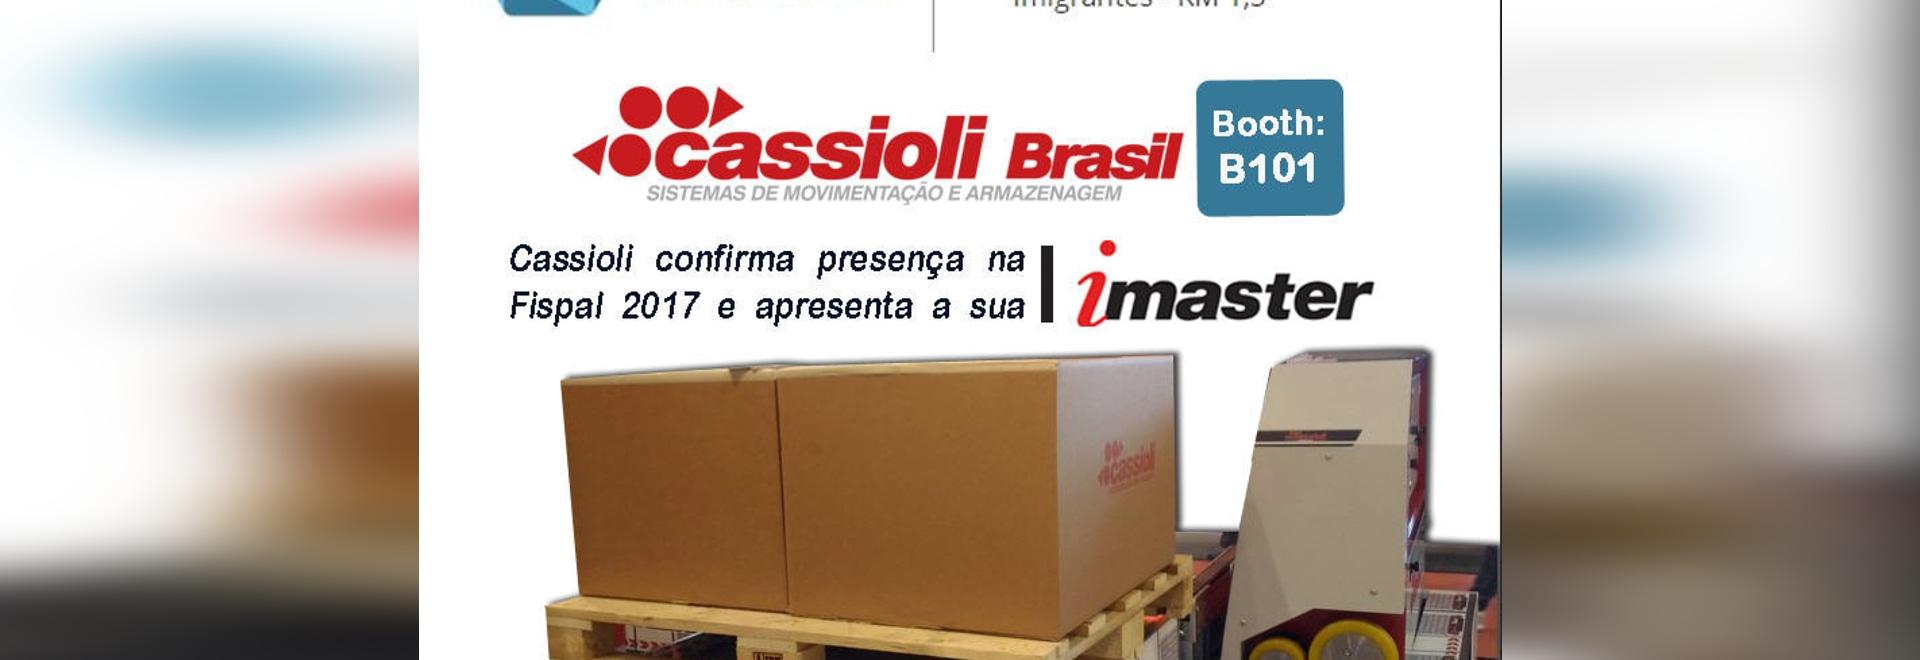 Cassioli at Fispal Tecnologia 2017 – São Paulo, 27-30 June